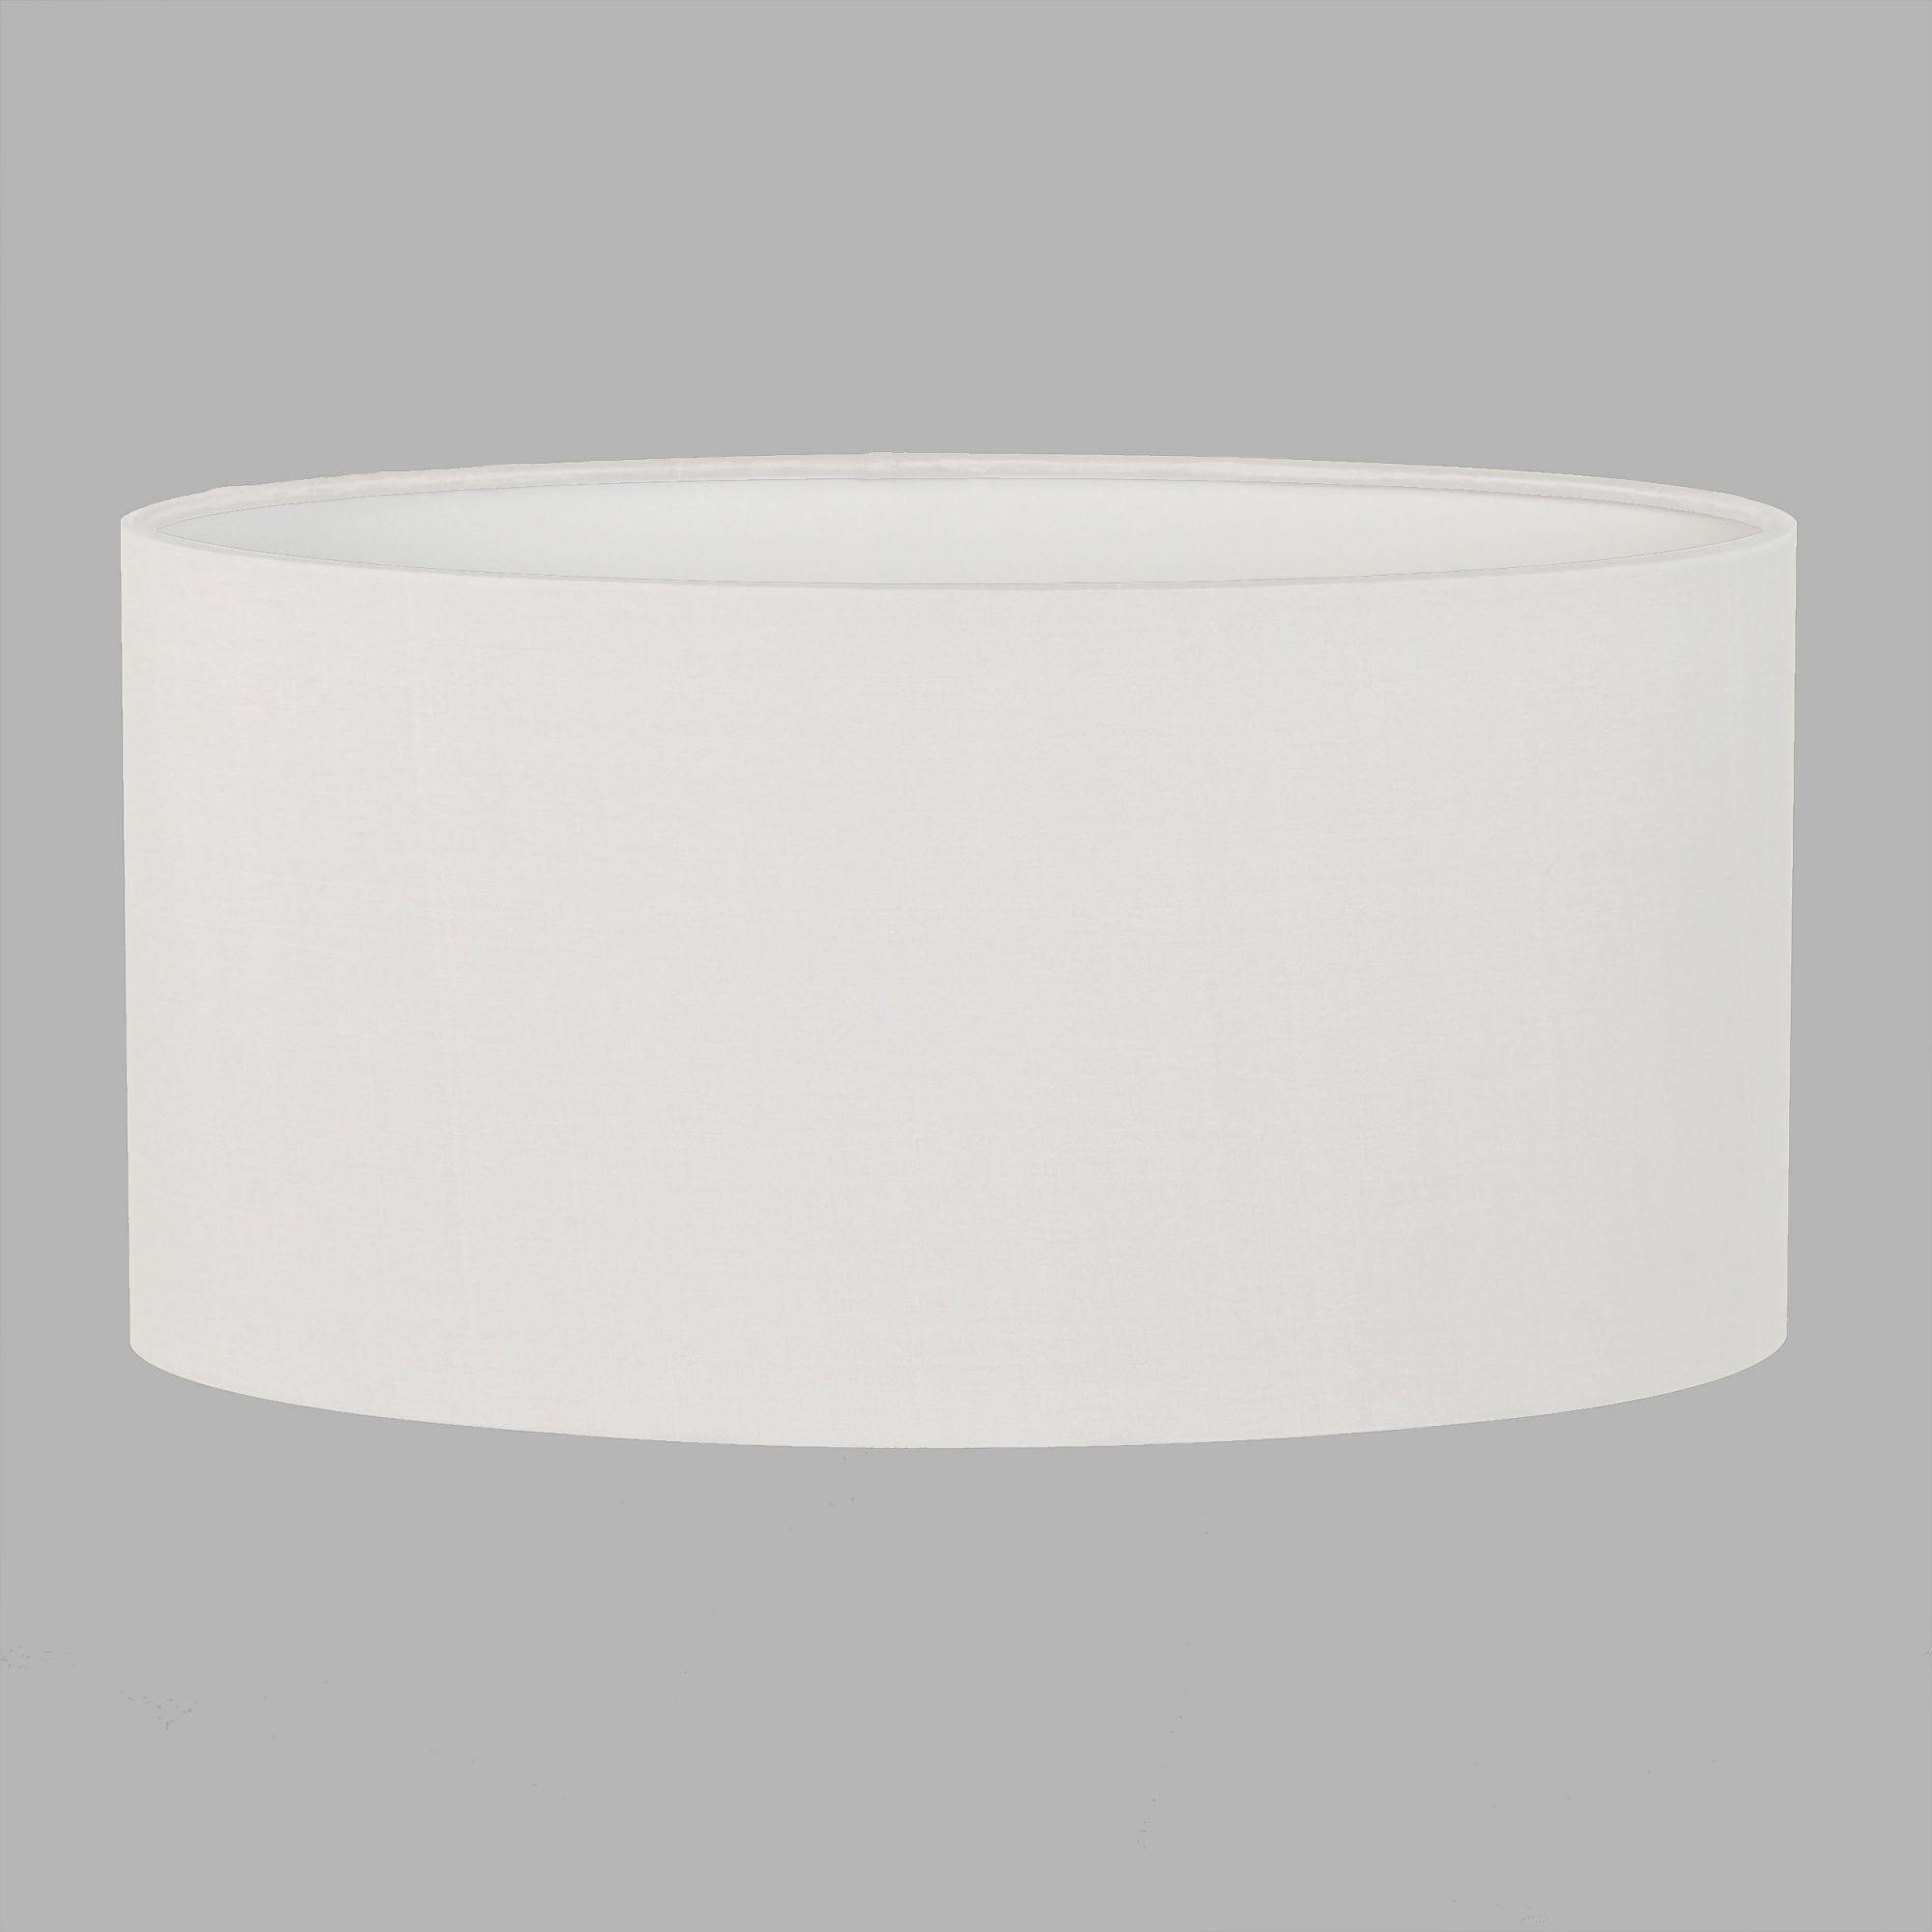 Abażur Oval 4054 Biały Astro Lighting